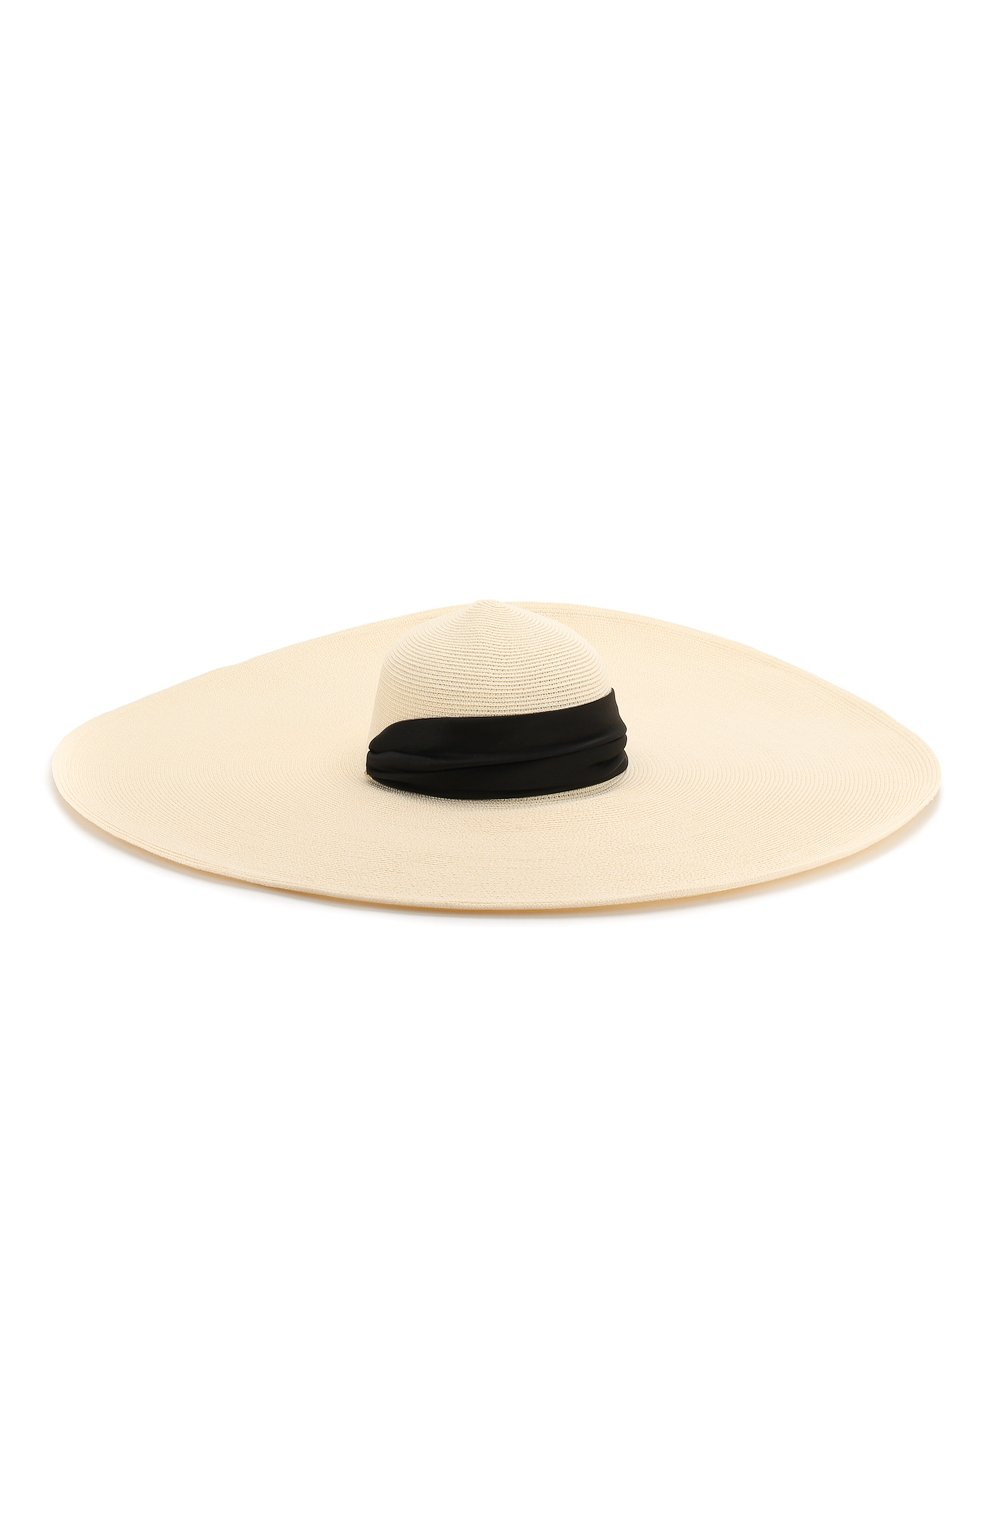 Шляпа Veruschka Eugenia Kim кремвого цвета | Фото №2